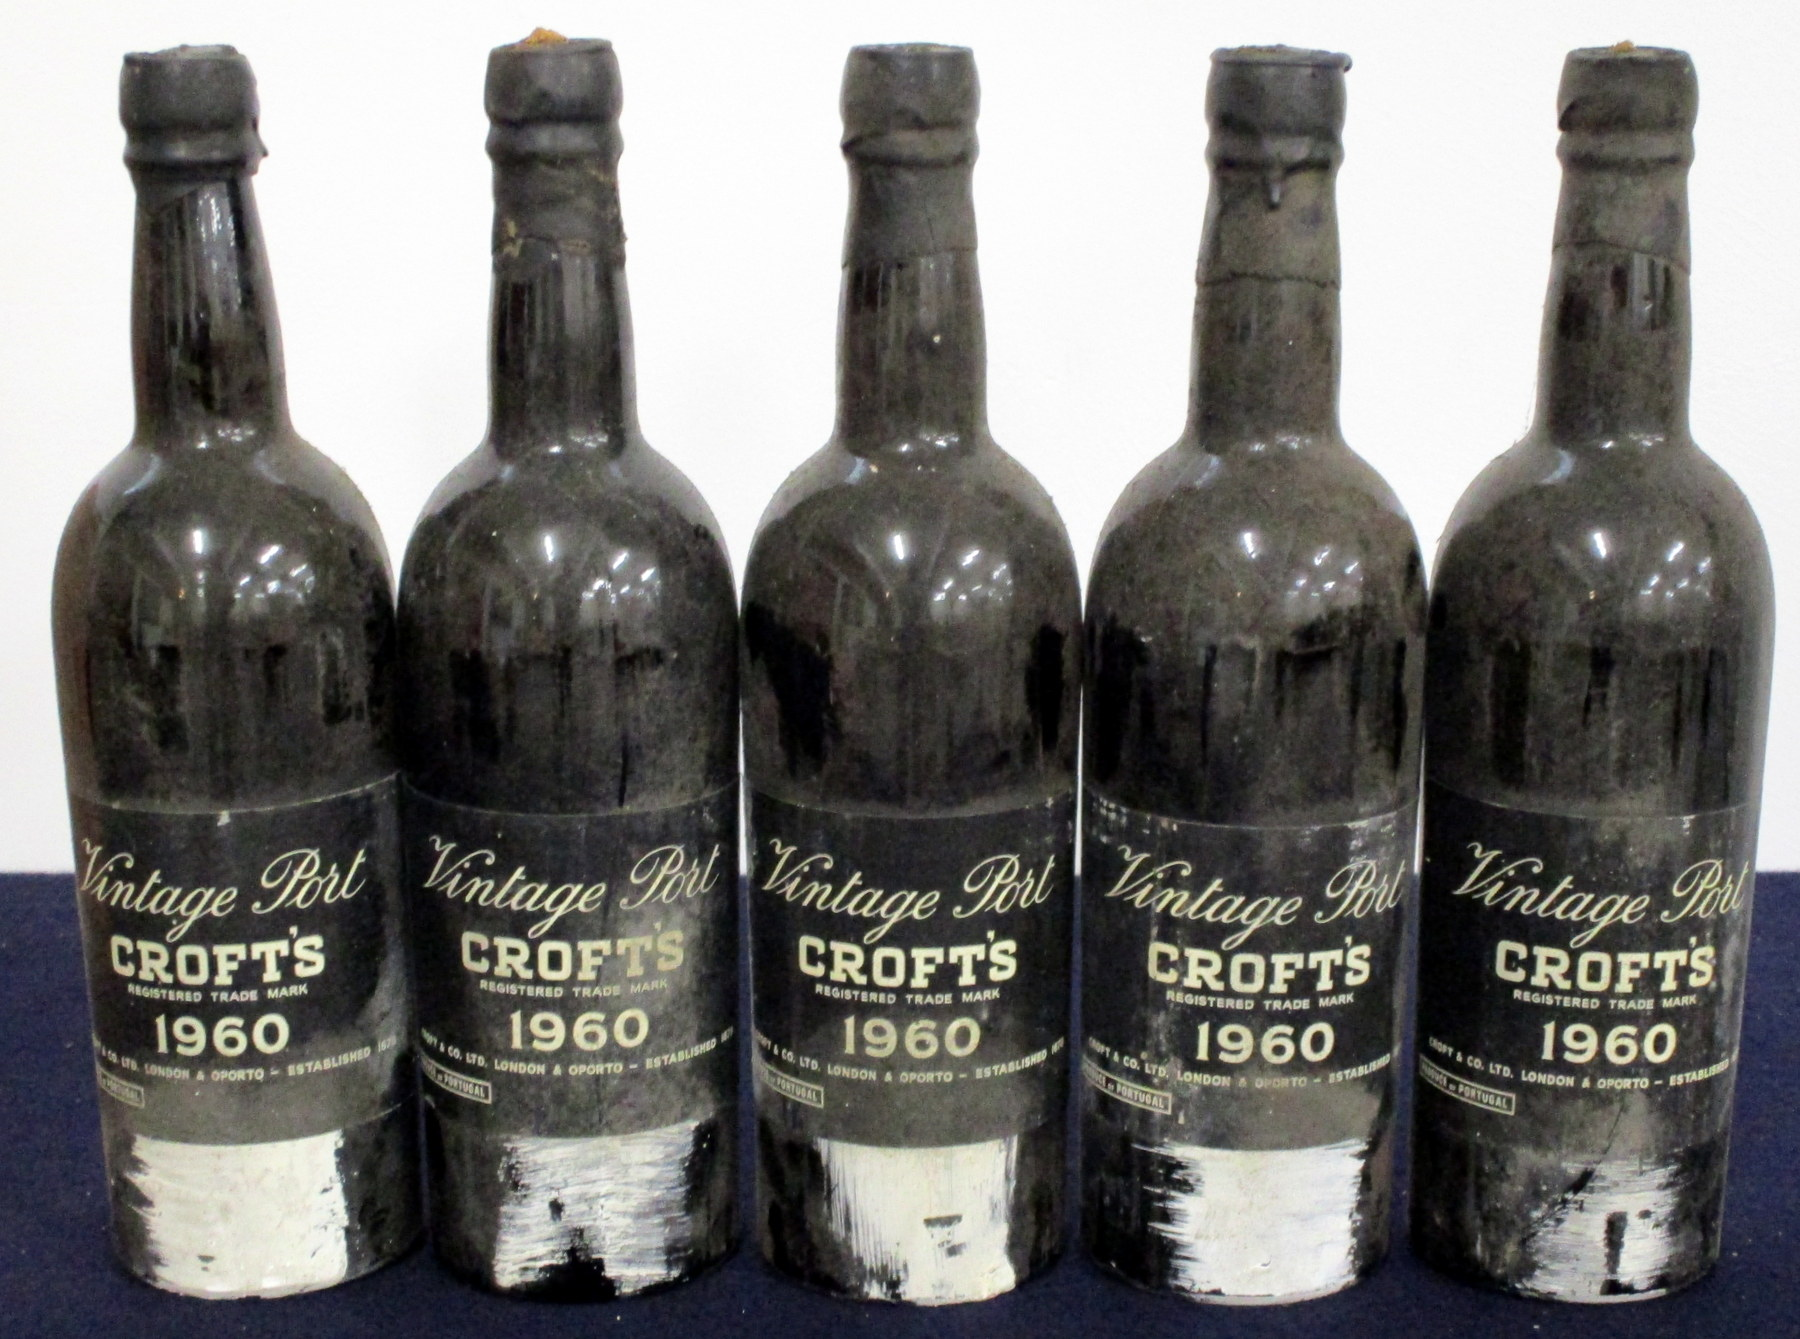 5 bts Croft's 1960 Vintage Port sl bs/aged